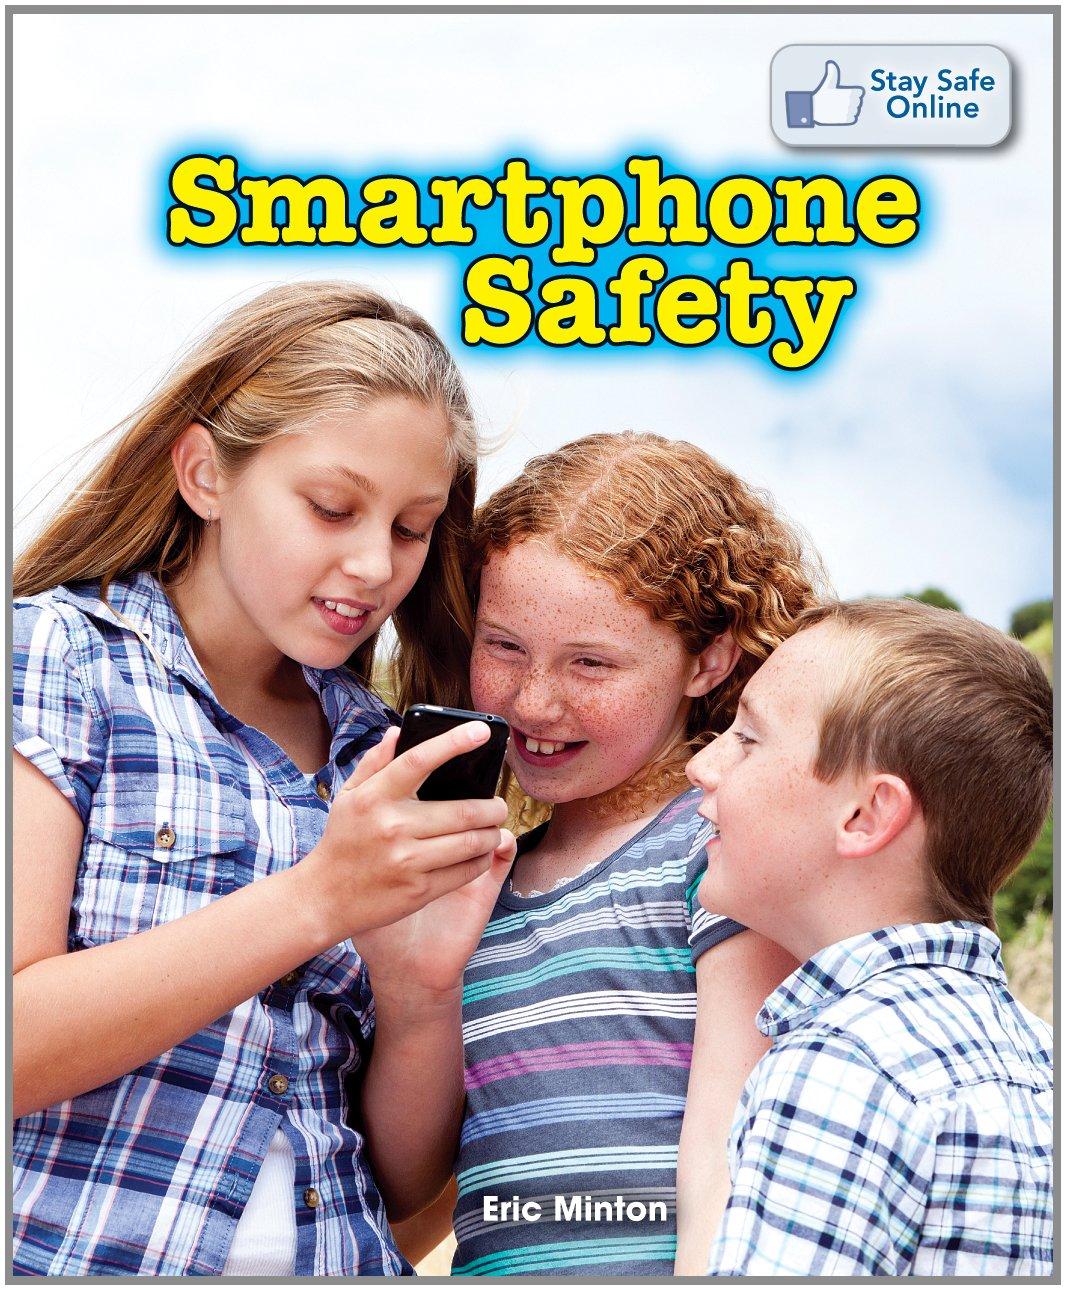 Smartphone Safety Stay Safe Online